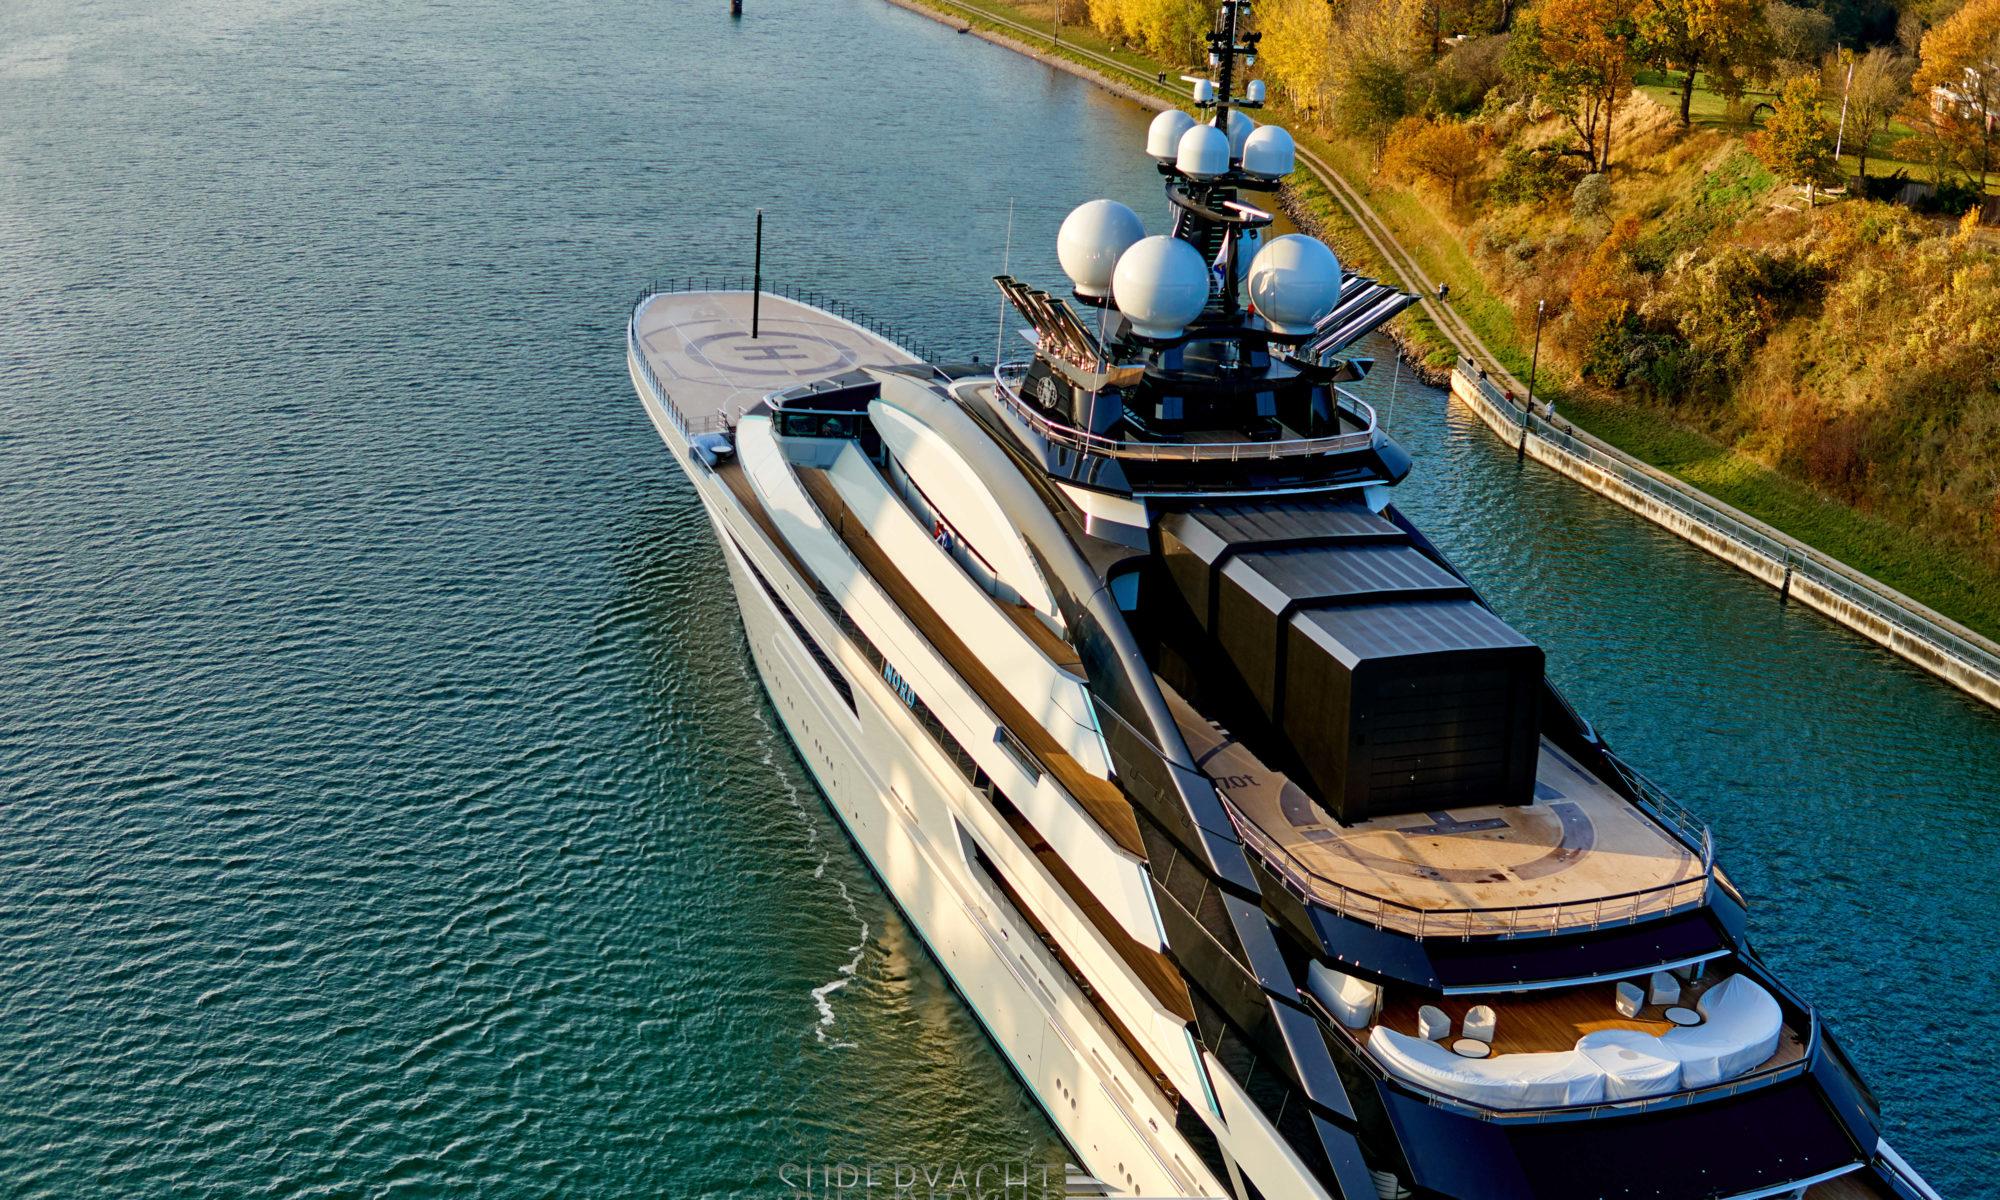 Superyacht Nord in Kiel